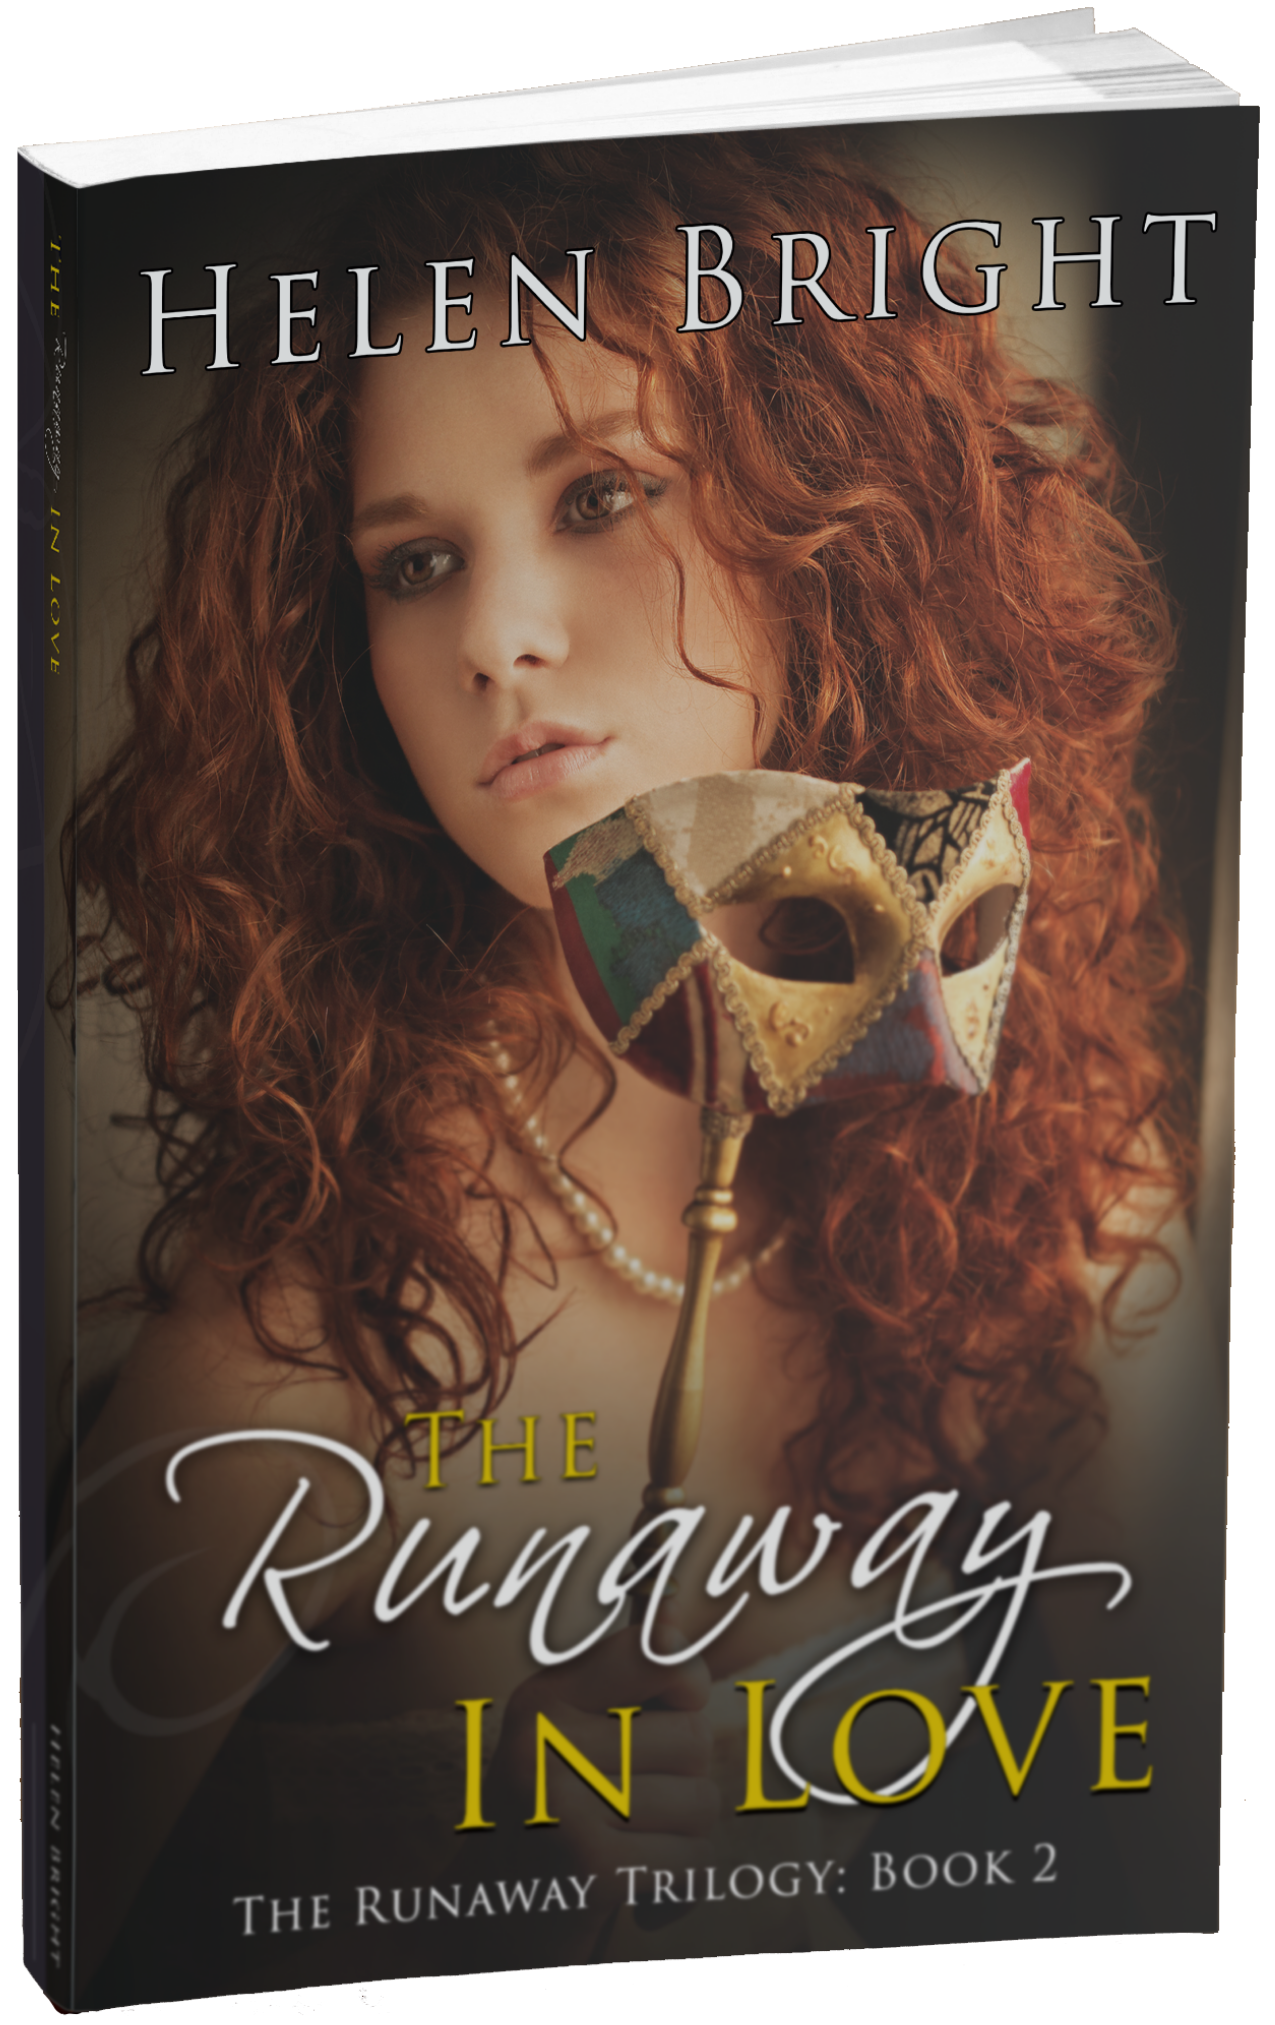 the runaway in love print mockup